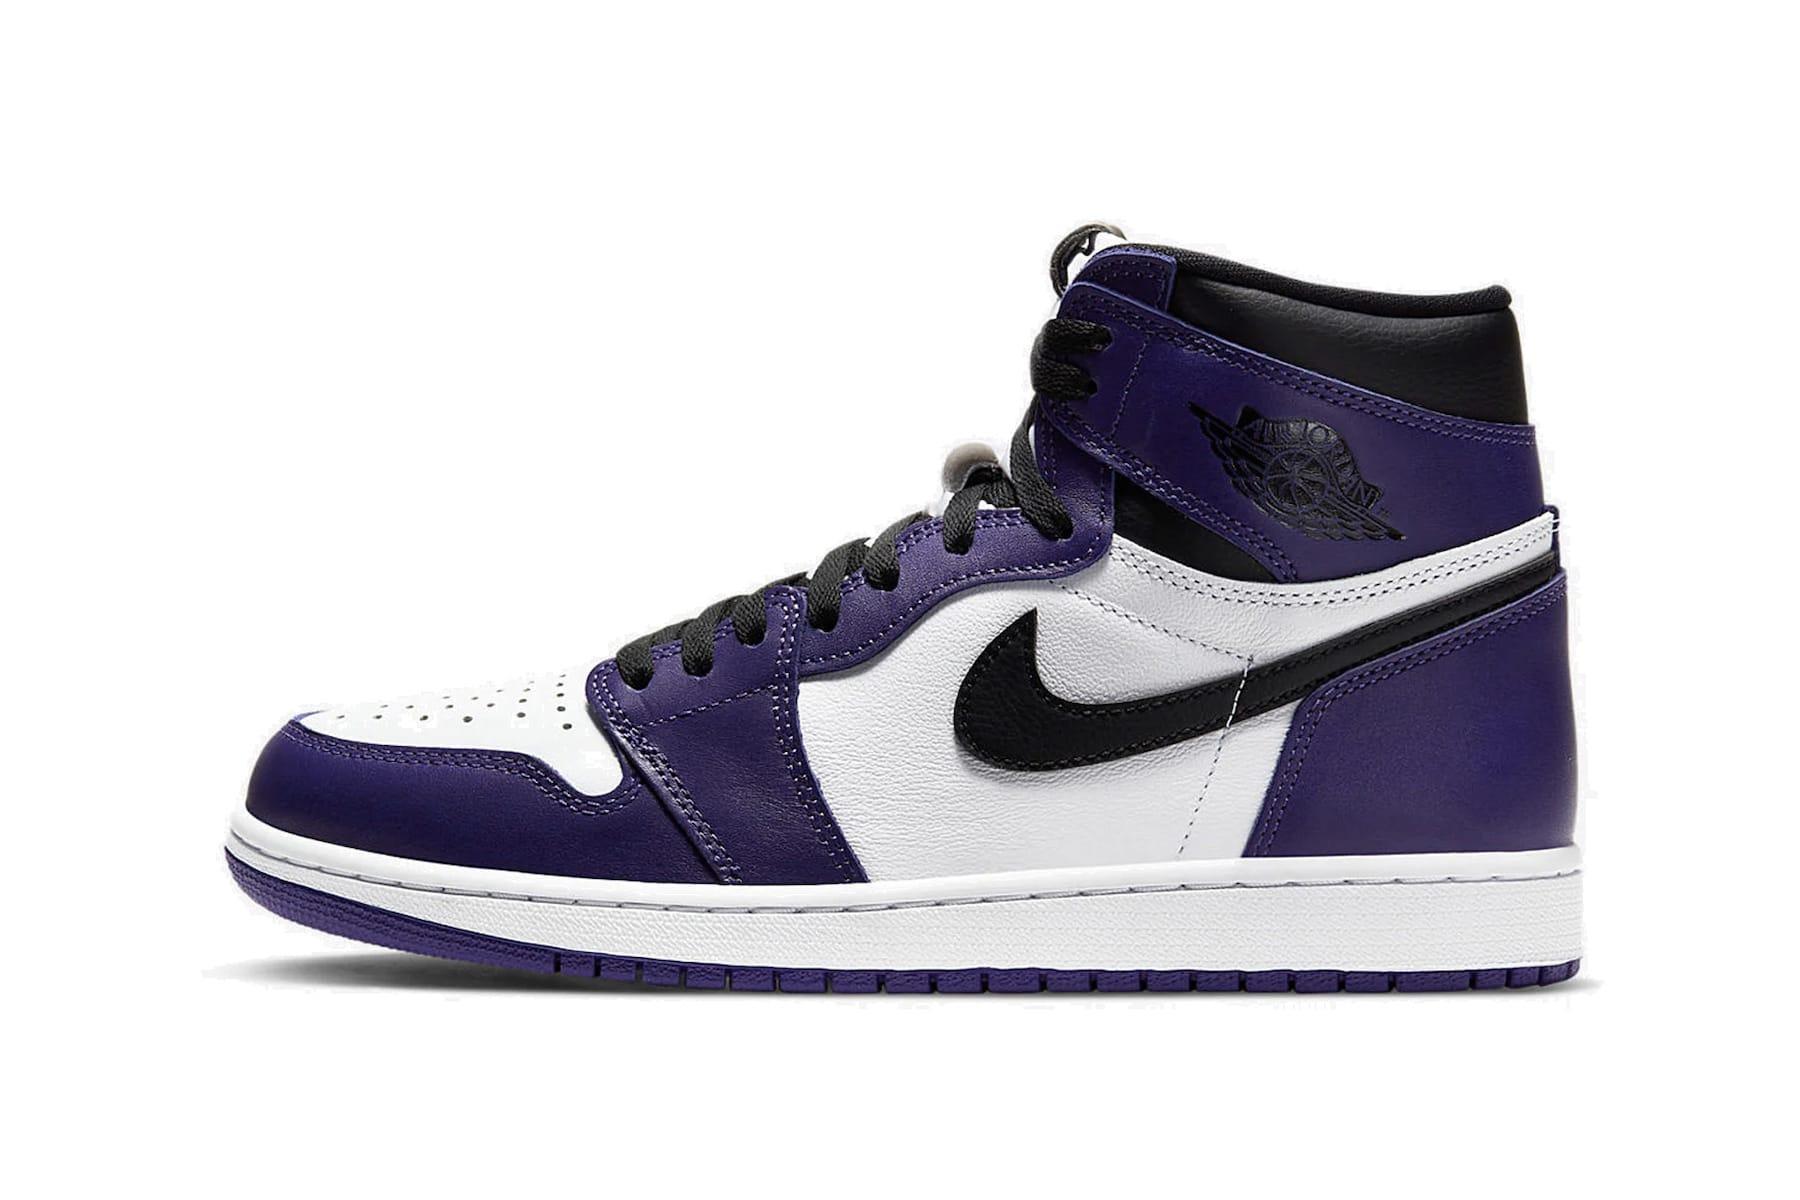 Nike Air Jordan 1 Retro Hi Purple/White